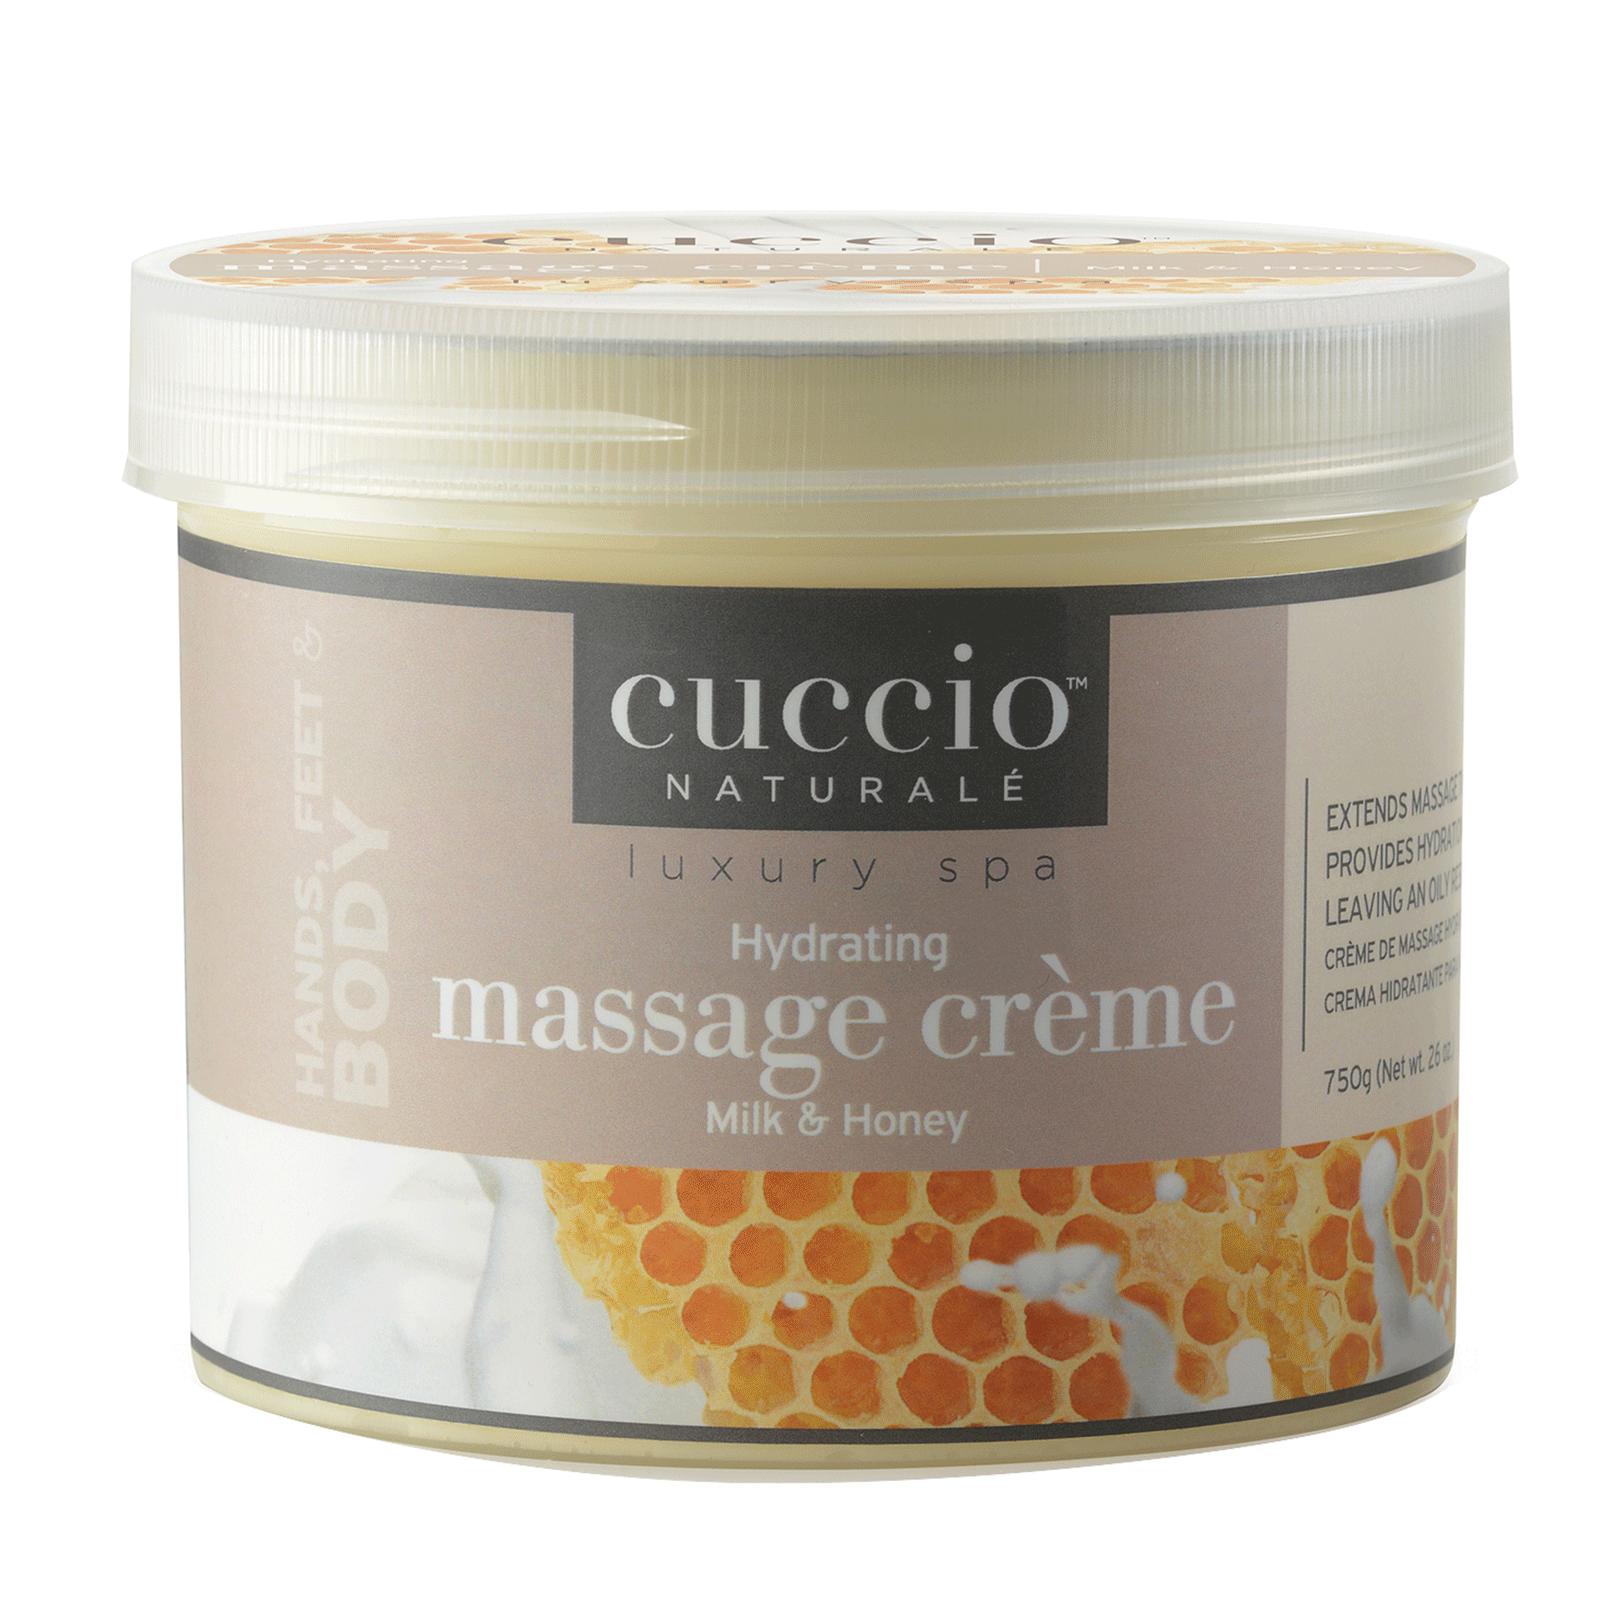 Cuccio Naturale Massage Creme,  Milk & Honey  26 oz